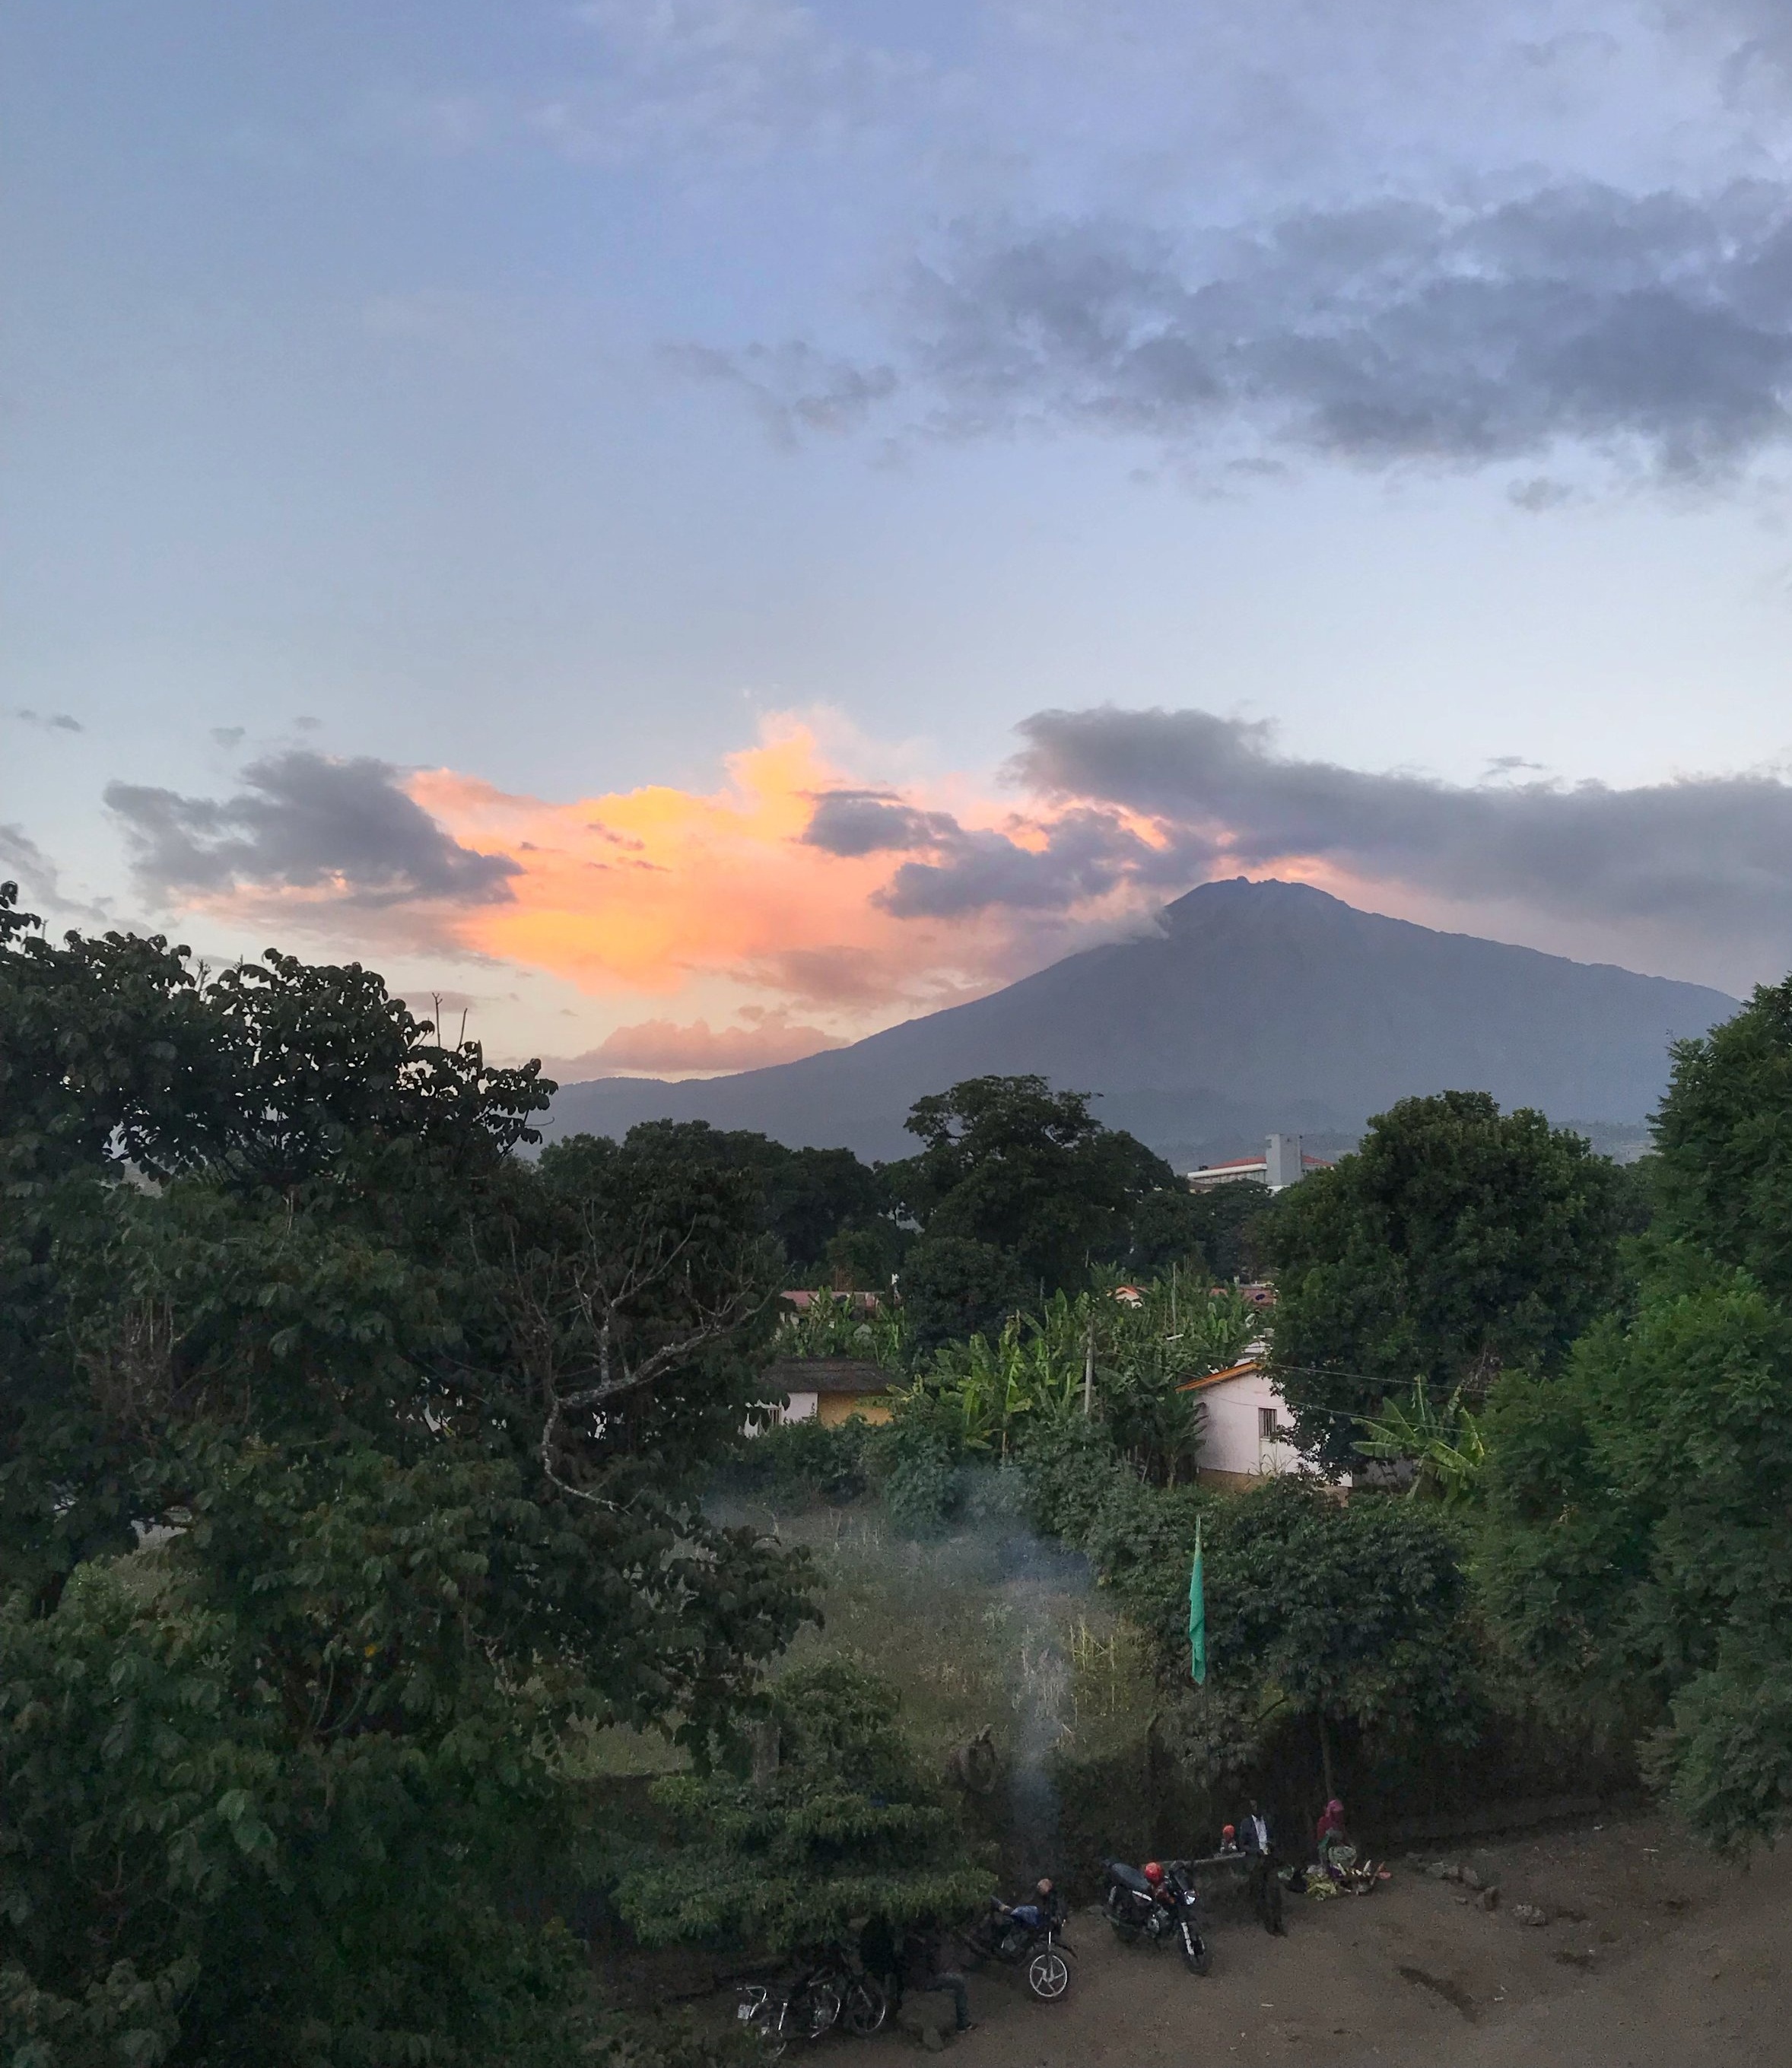 Mt. Meru - Morning views of one of the acclimatization mountains most people climb before attempting Kilimanjaro, Mt. Meru (14,977 feet)